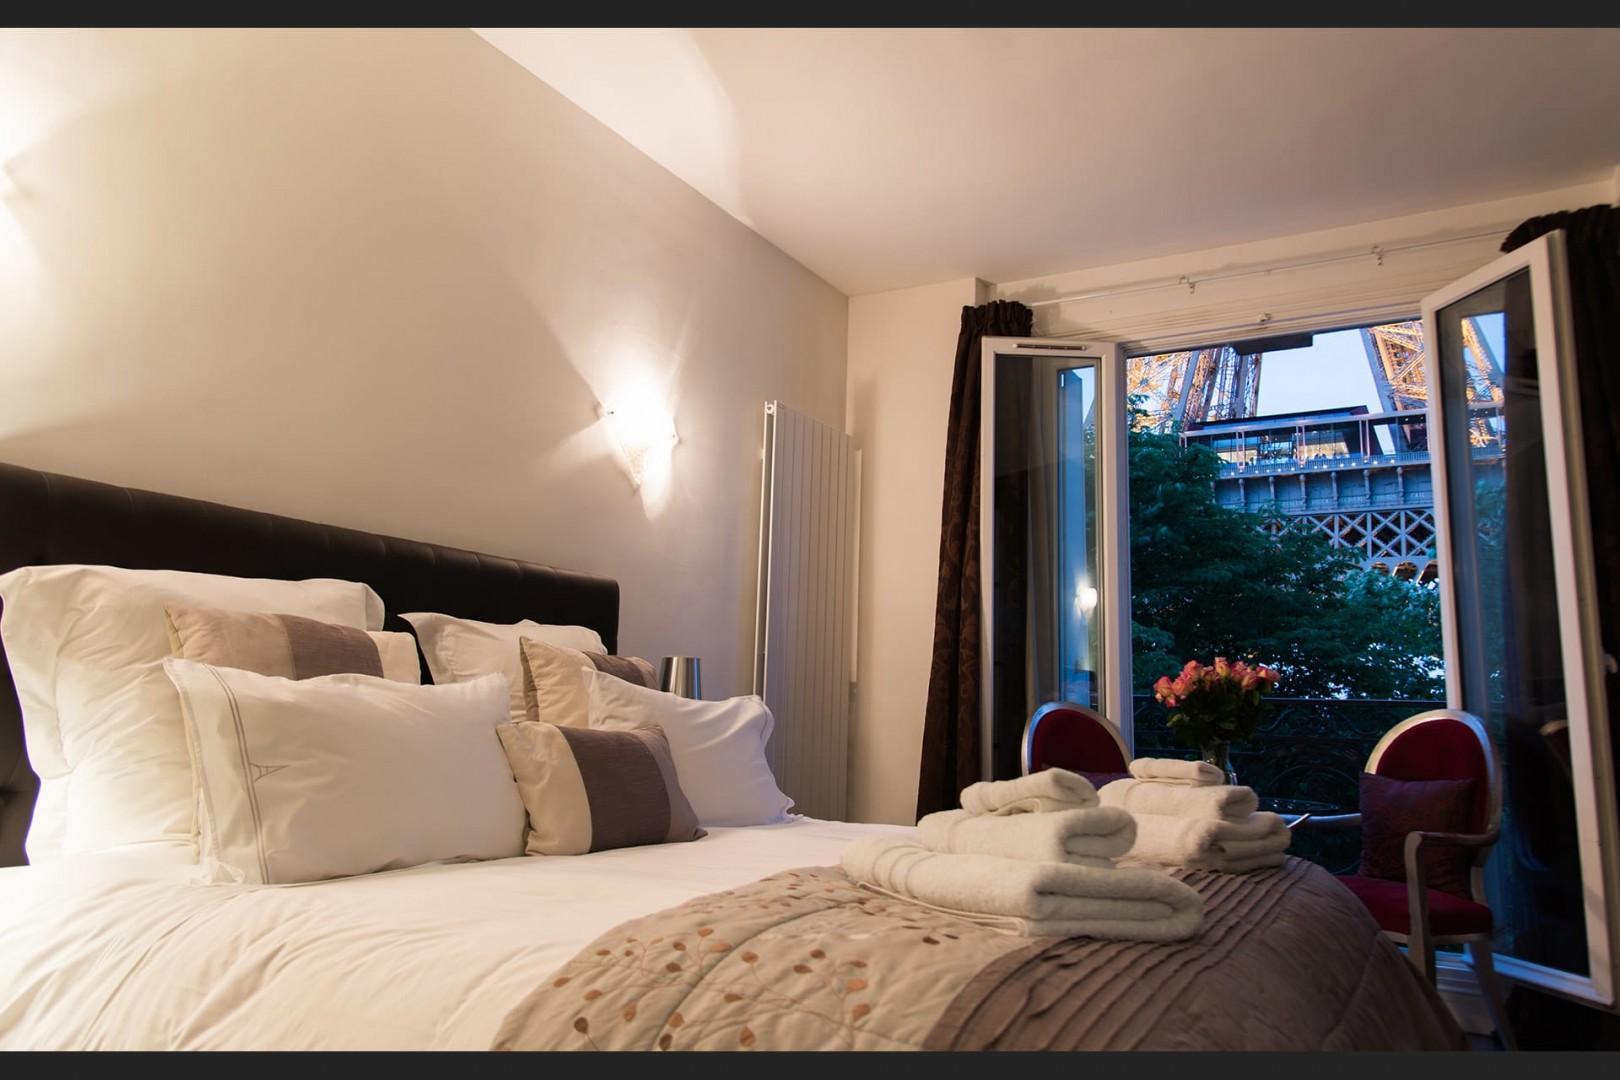 Enjoy the most romantic bedroom in Paris!